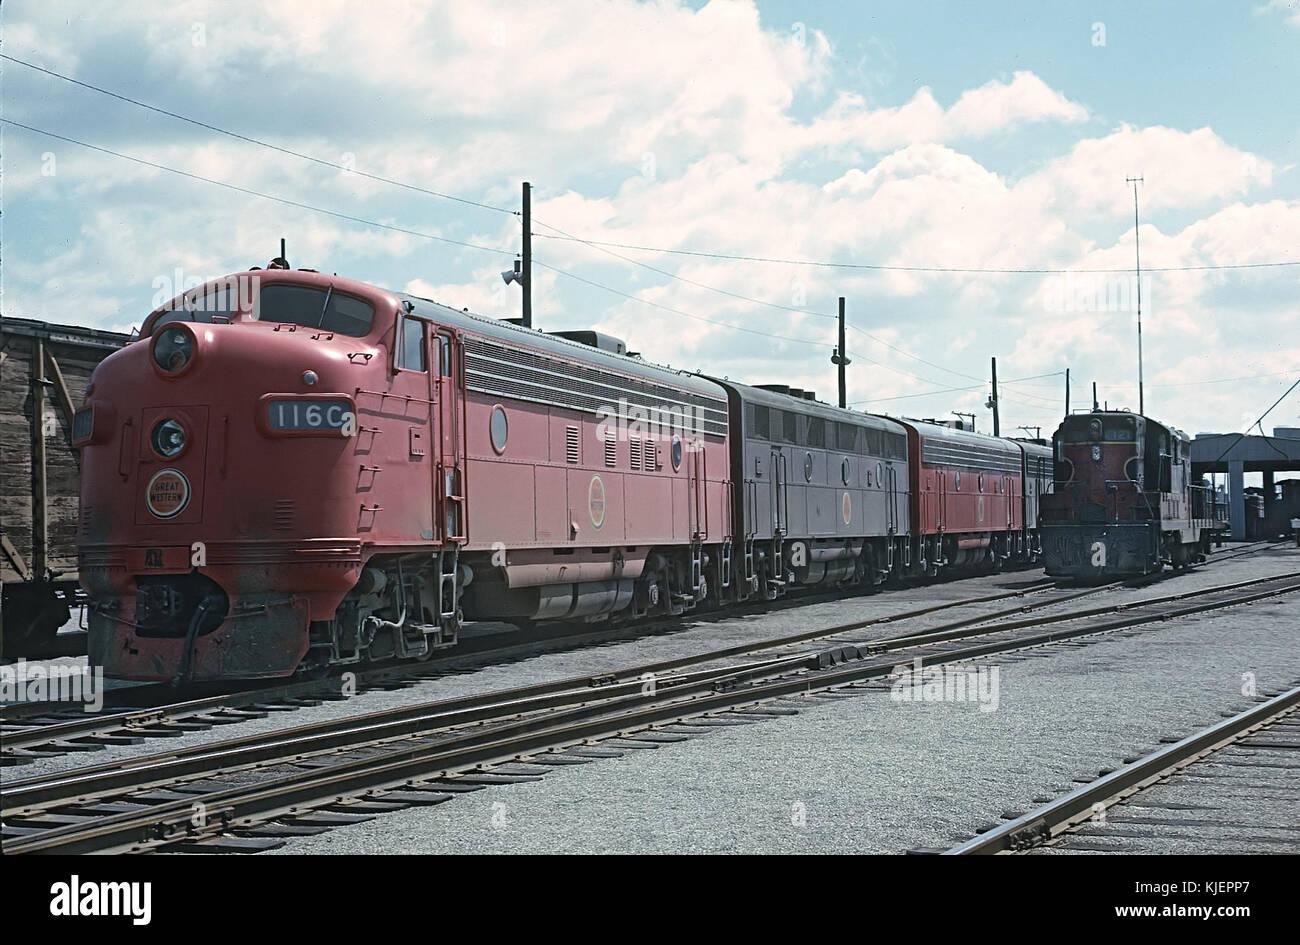 CGW 116C May 1964 (21819084604) - Stock Image